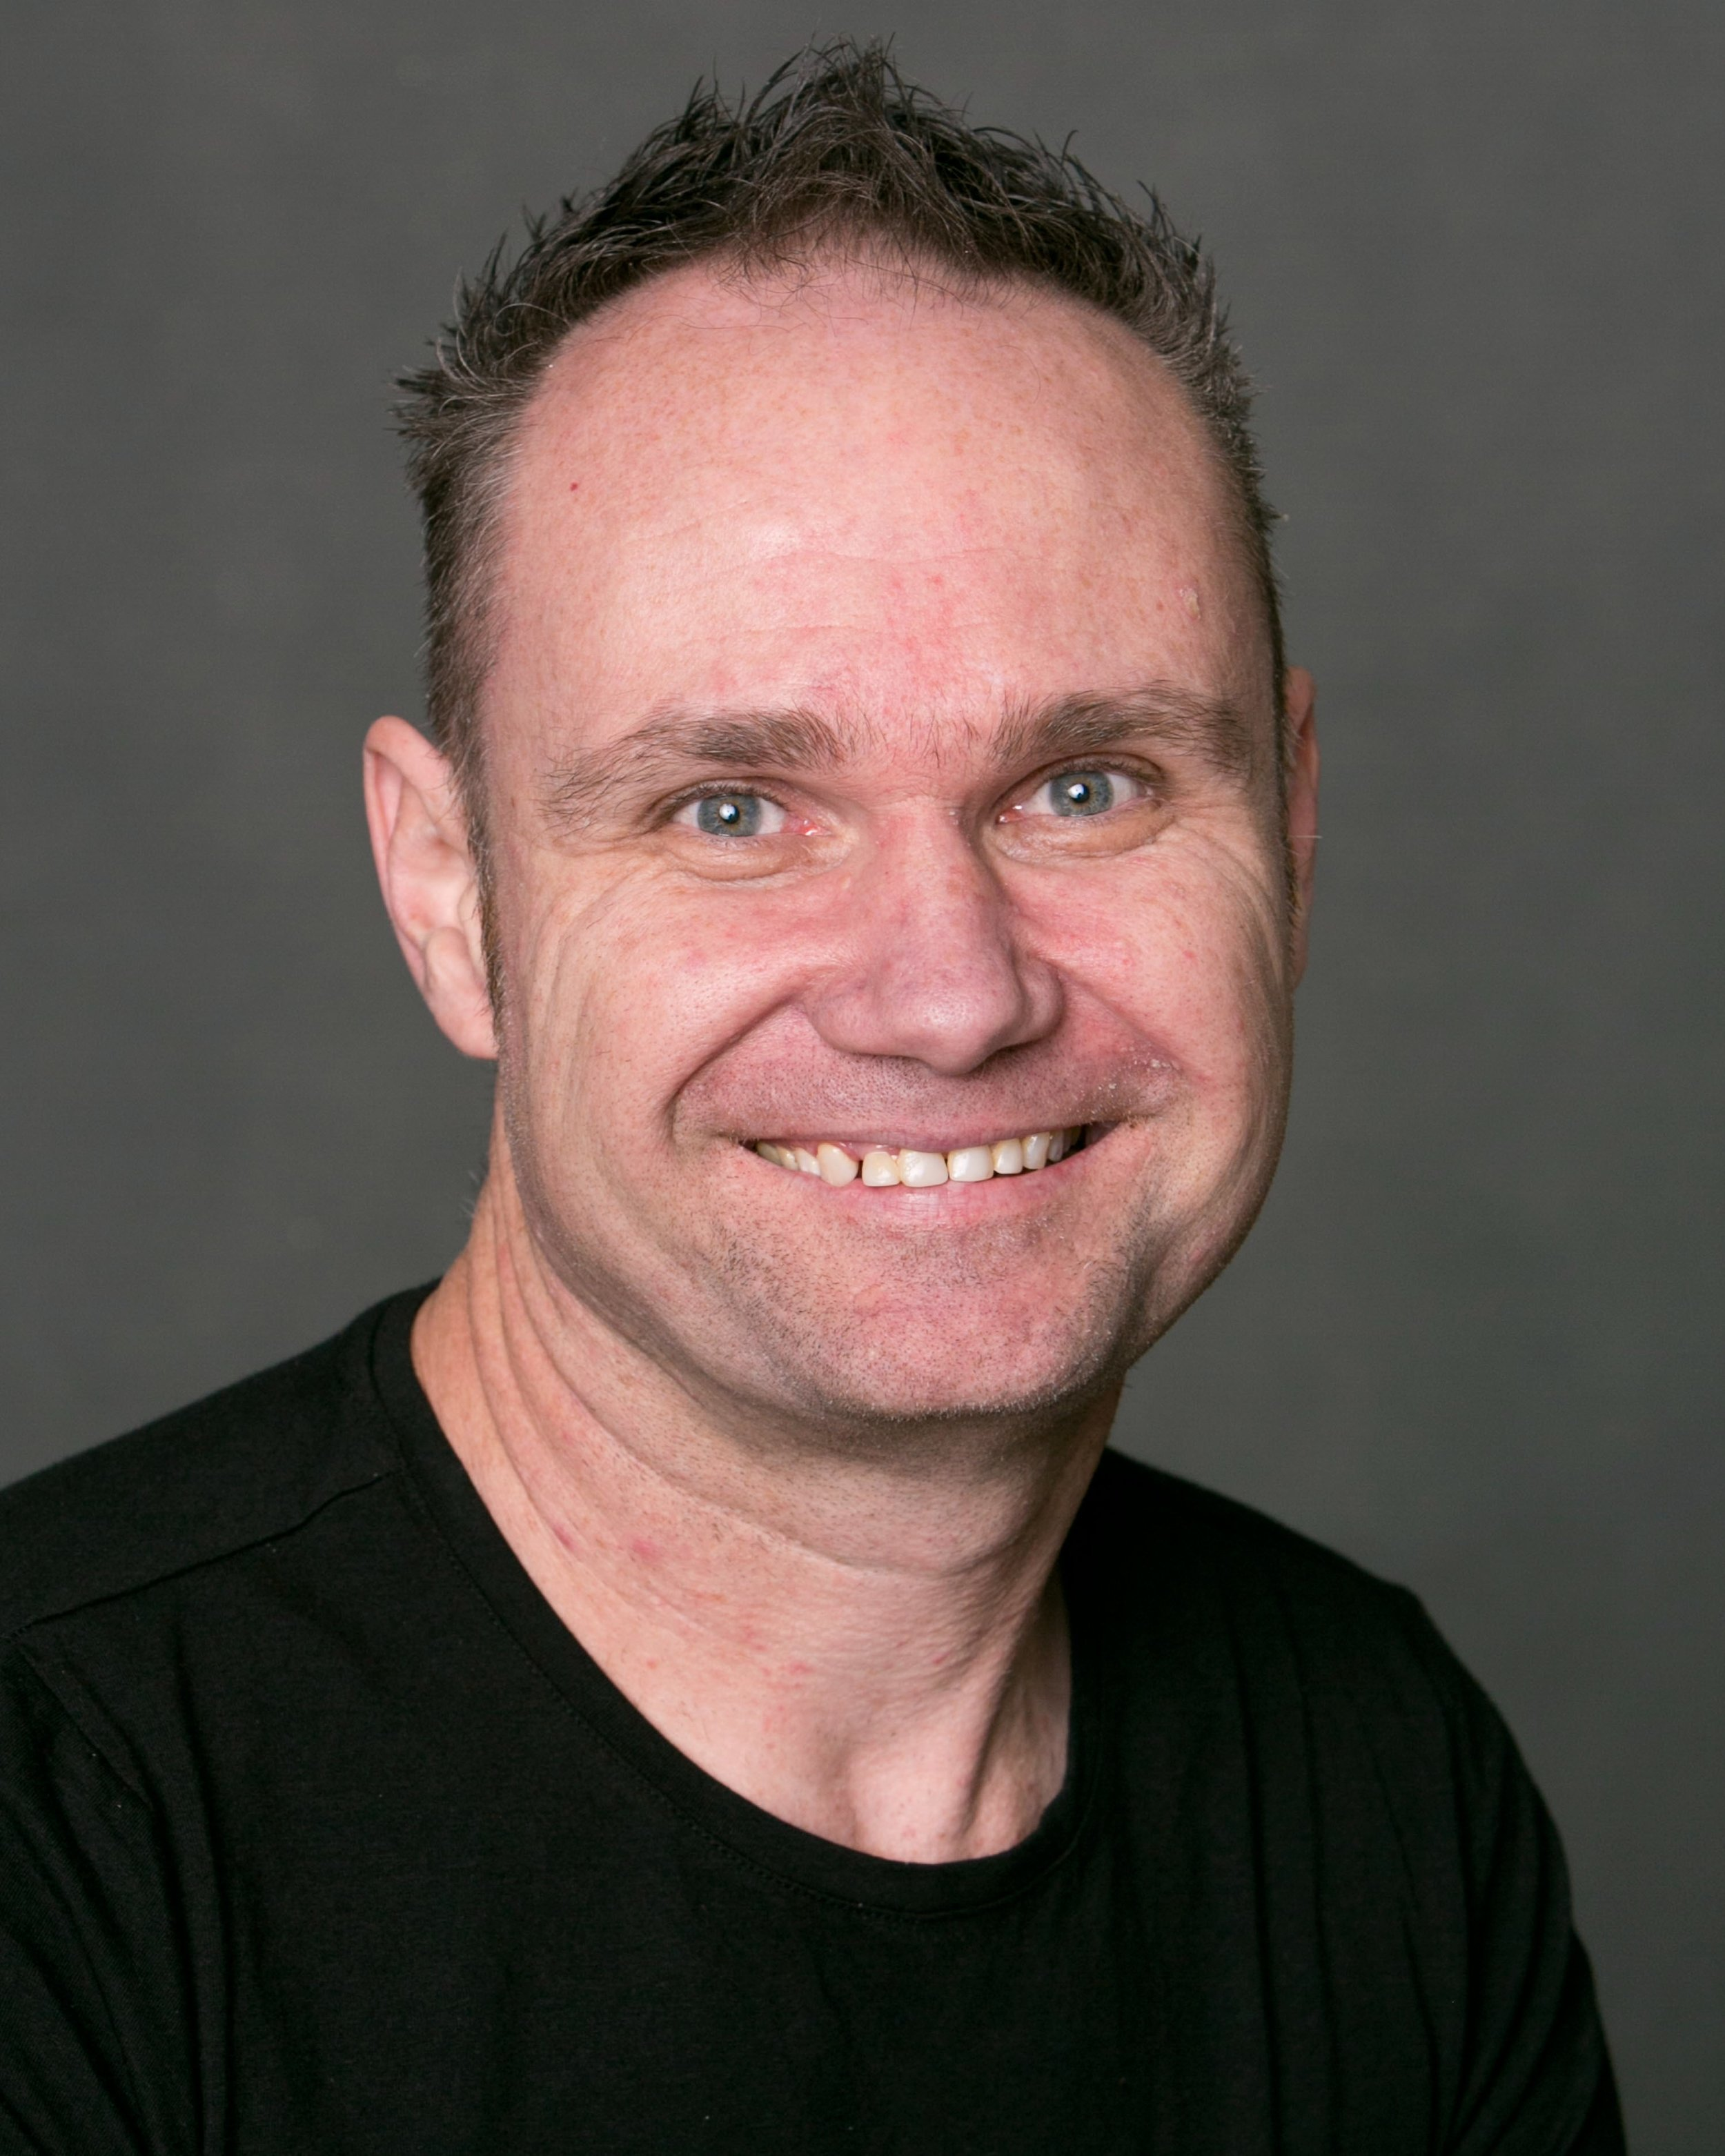 JASON BOVAIRD | lighting designer